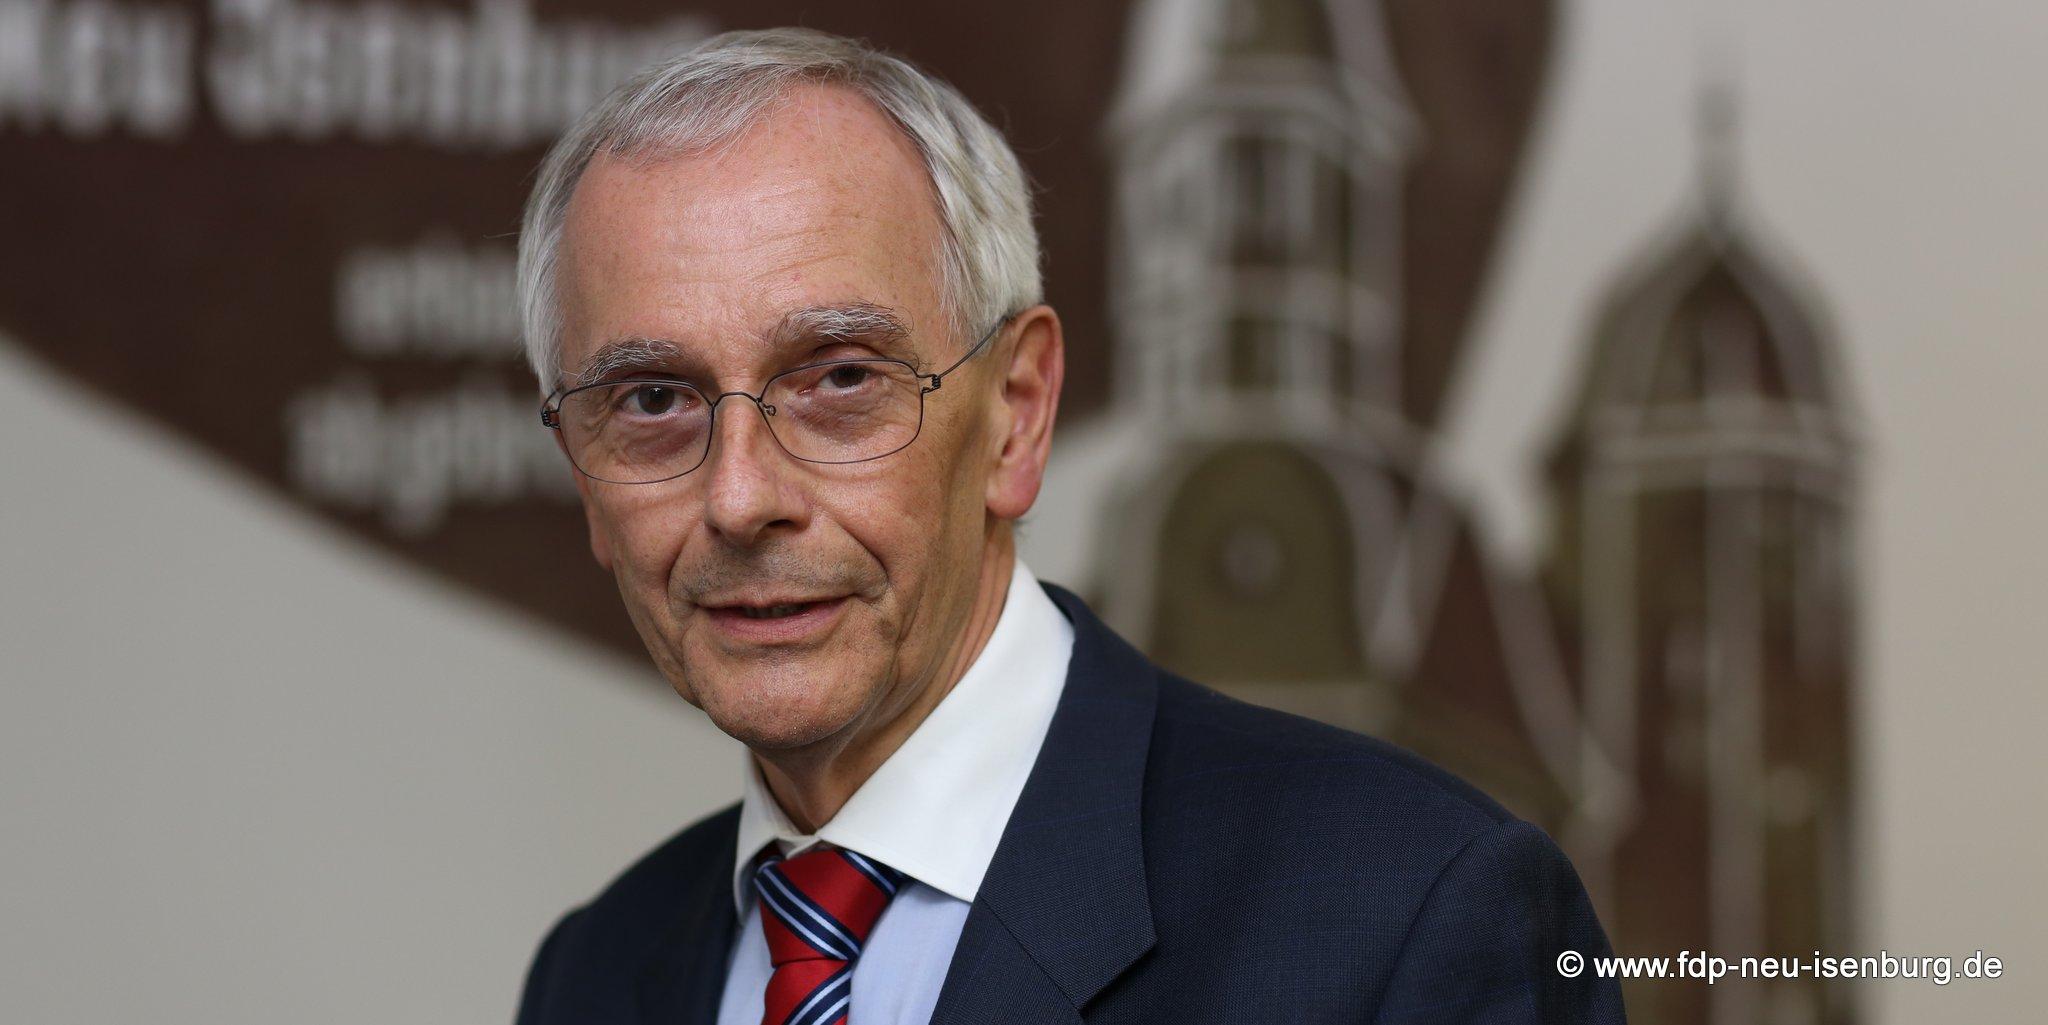 Hans-Joachim Neumann